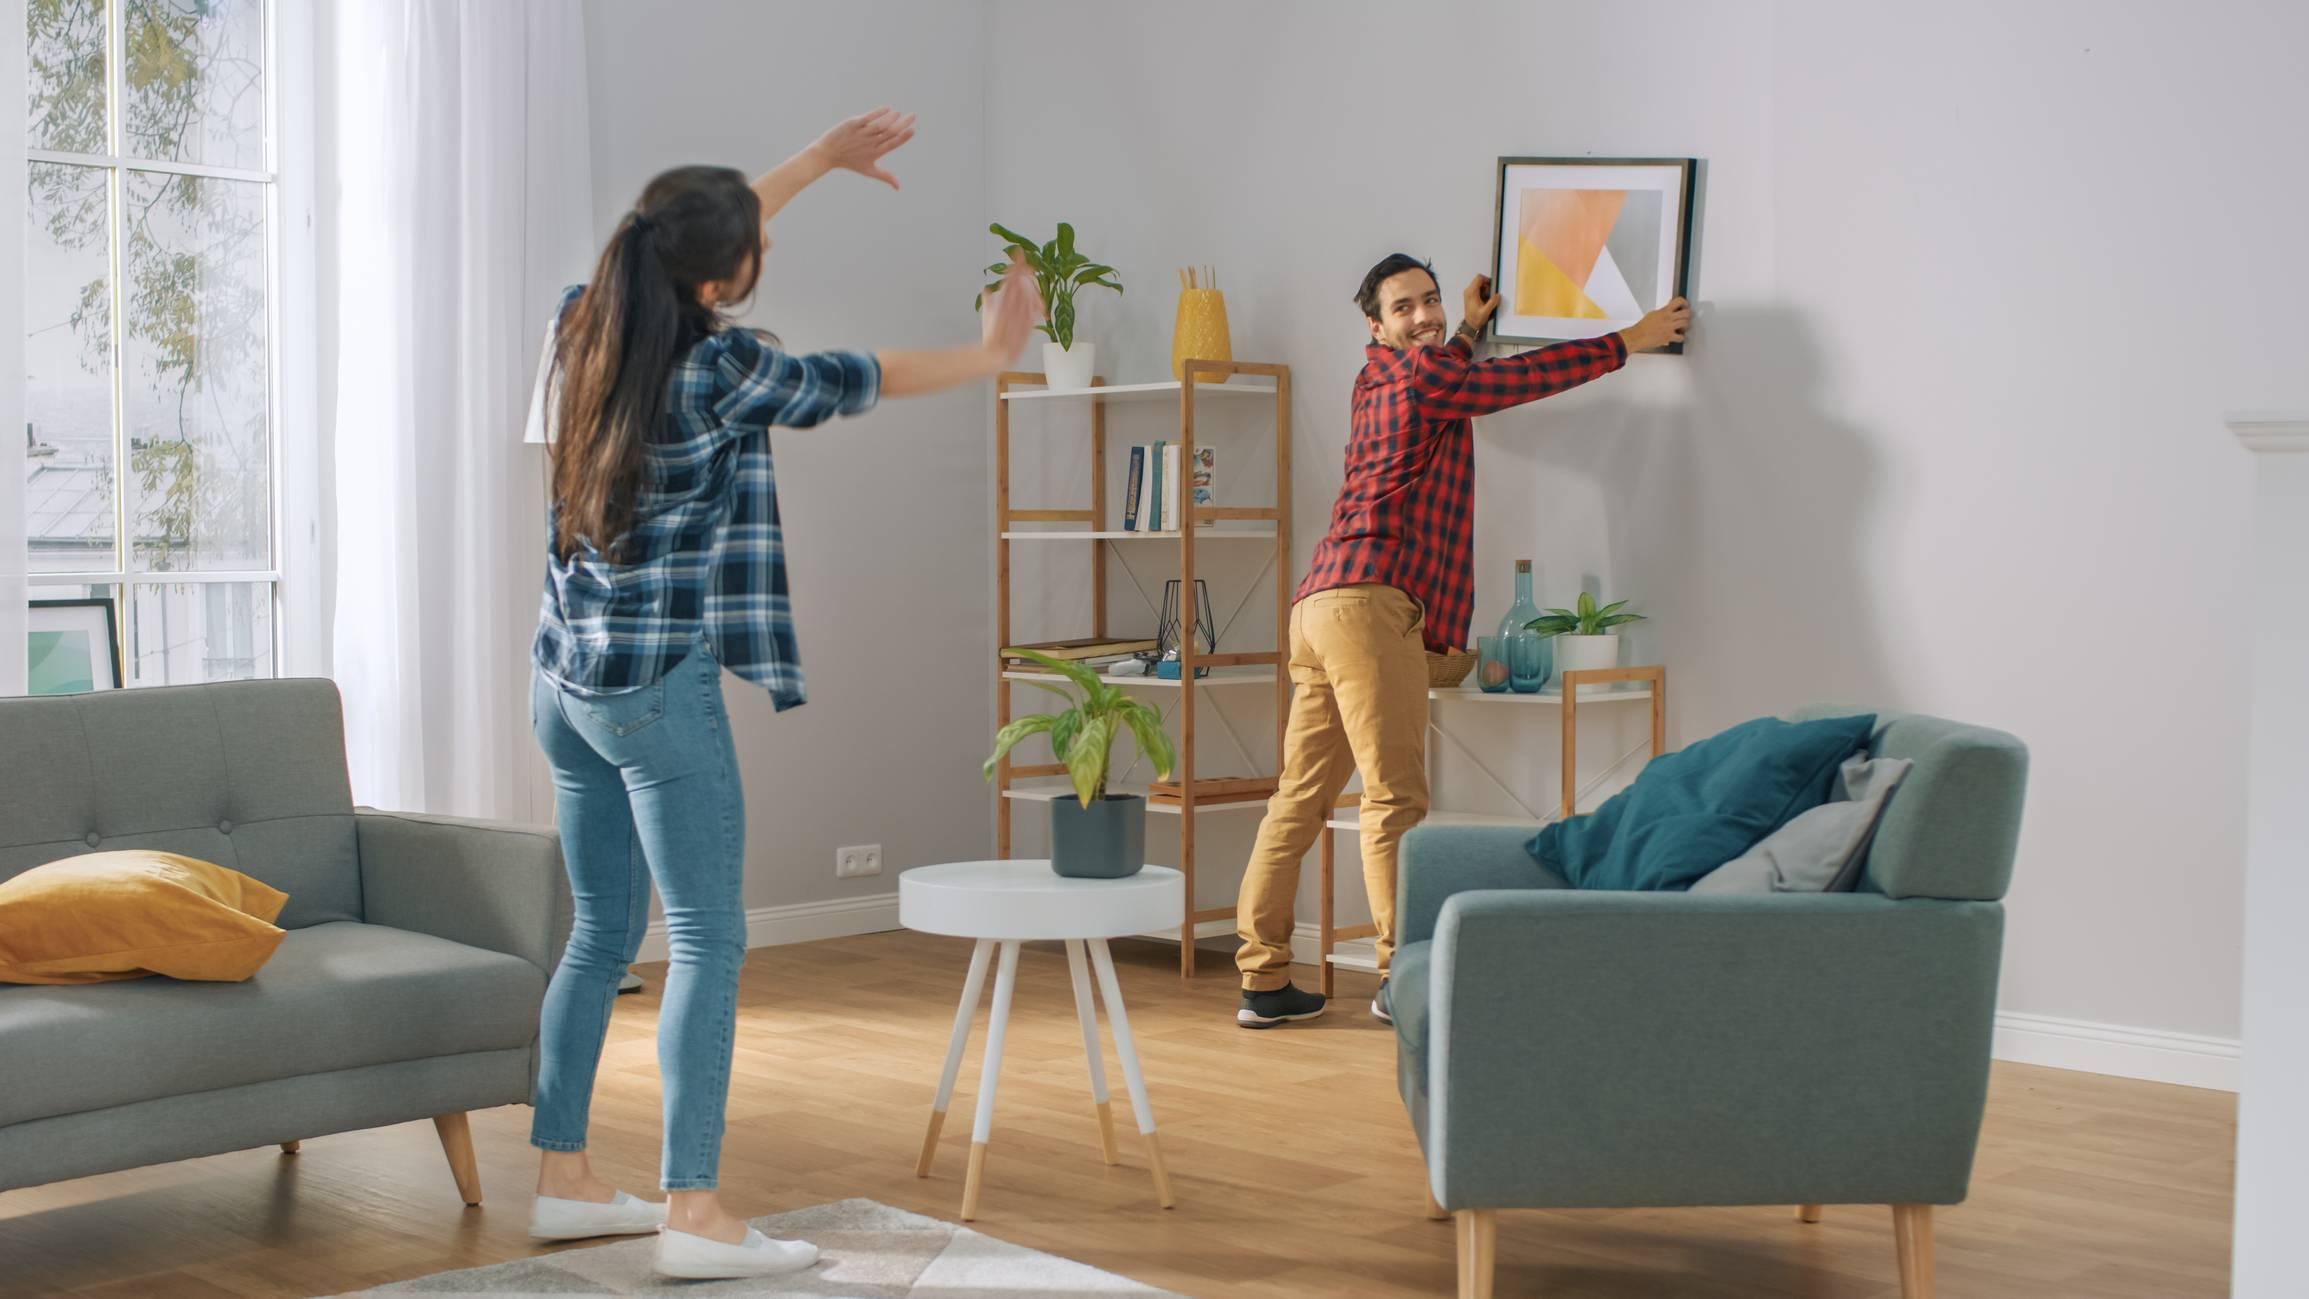 mettre en valeur un bien immobilier